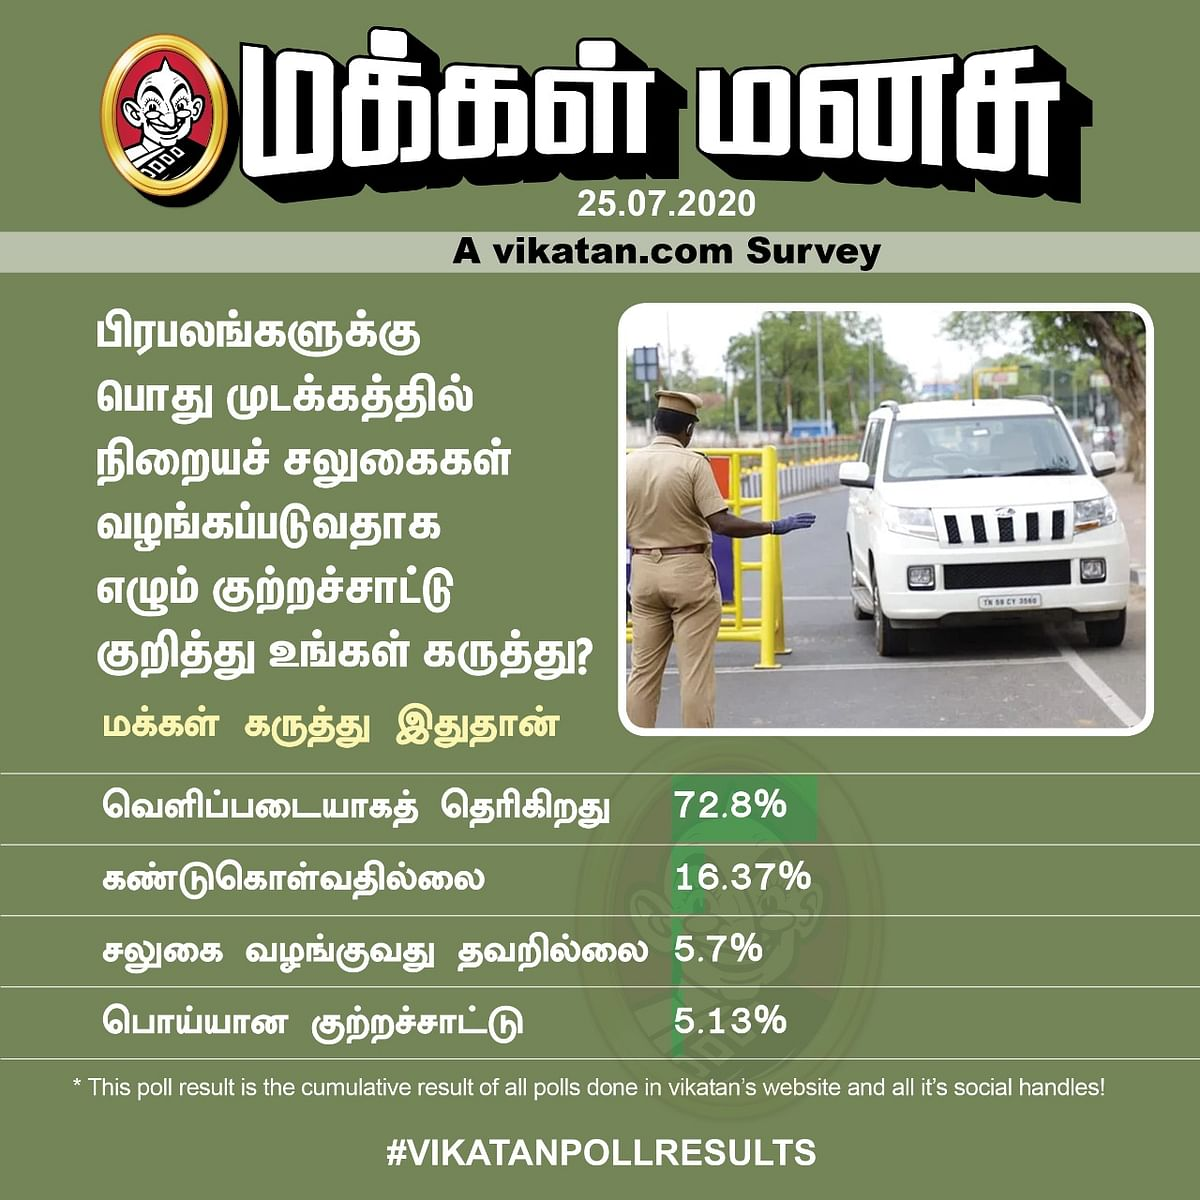 Celebrity | Vikatan Poll